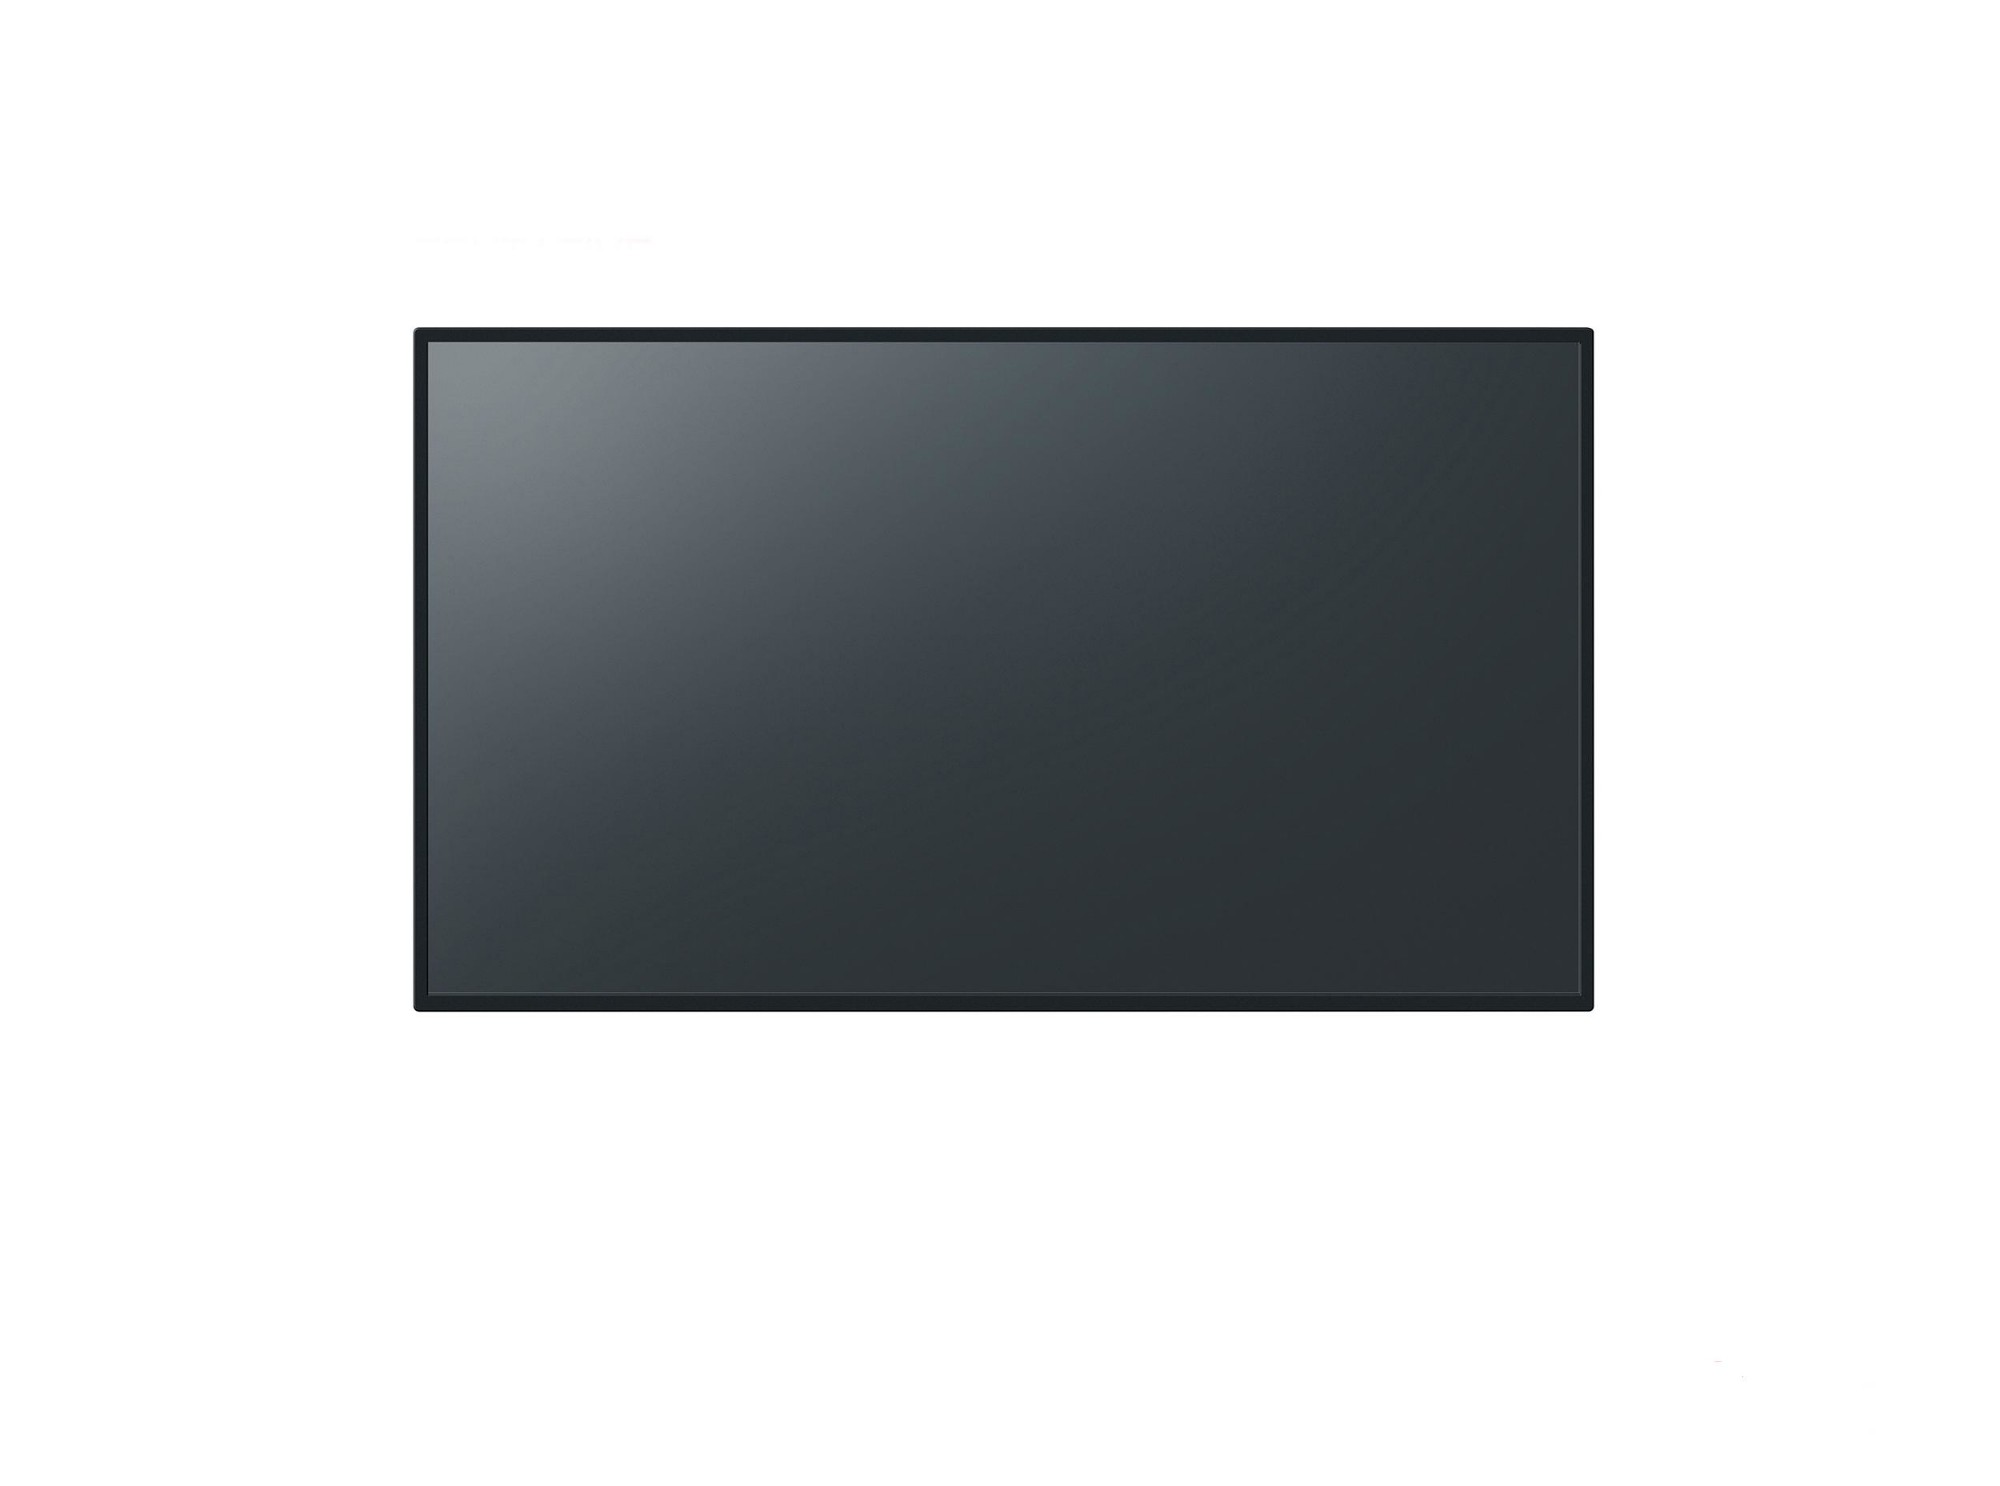 Panasonic TH-43LFE8E 43'' Digital Signage Commercial Display